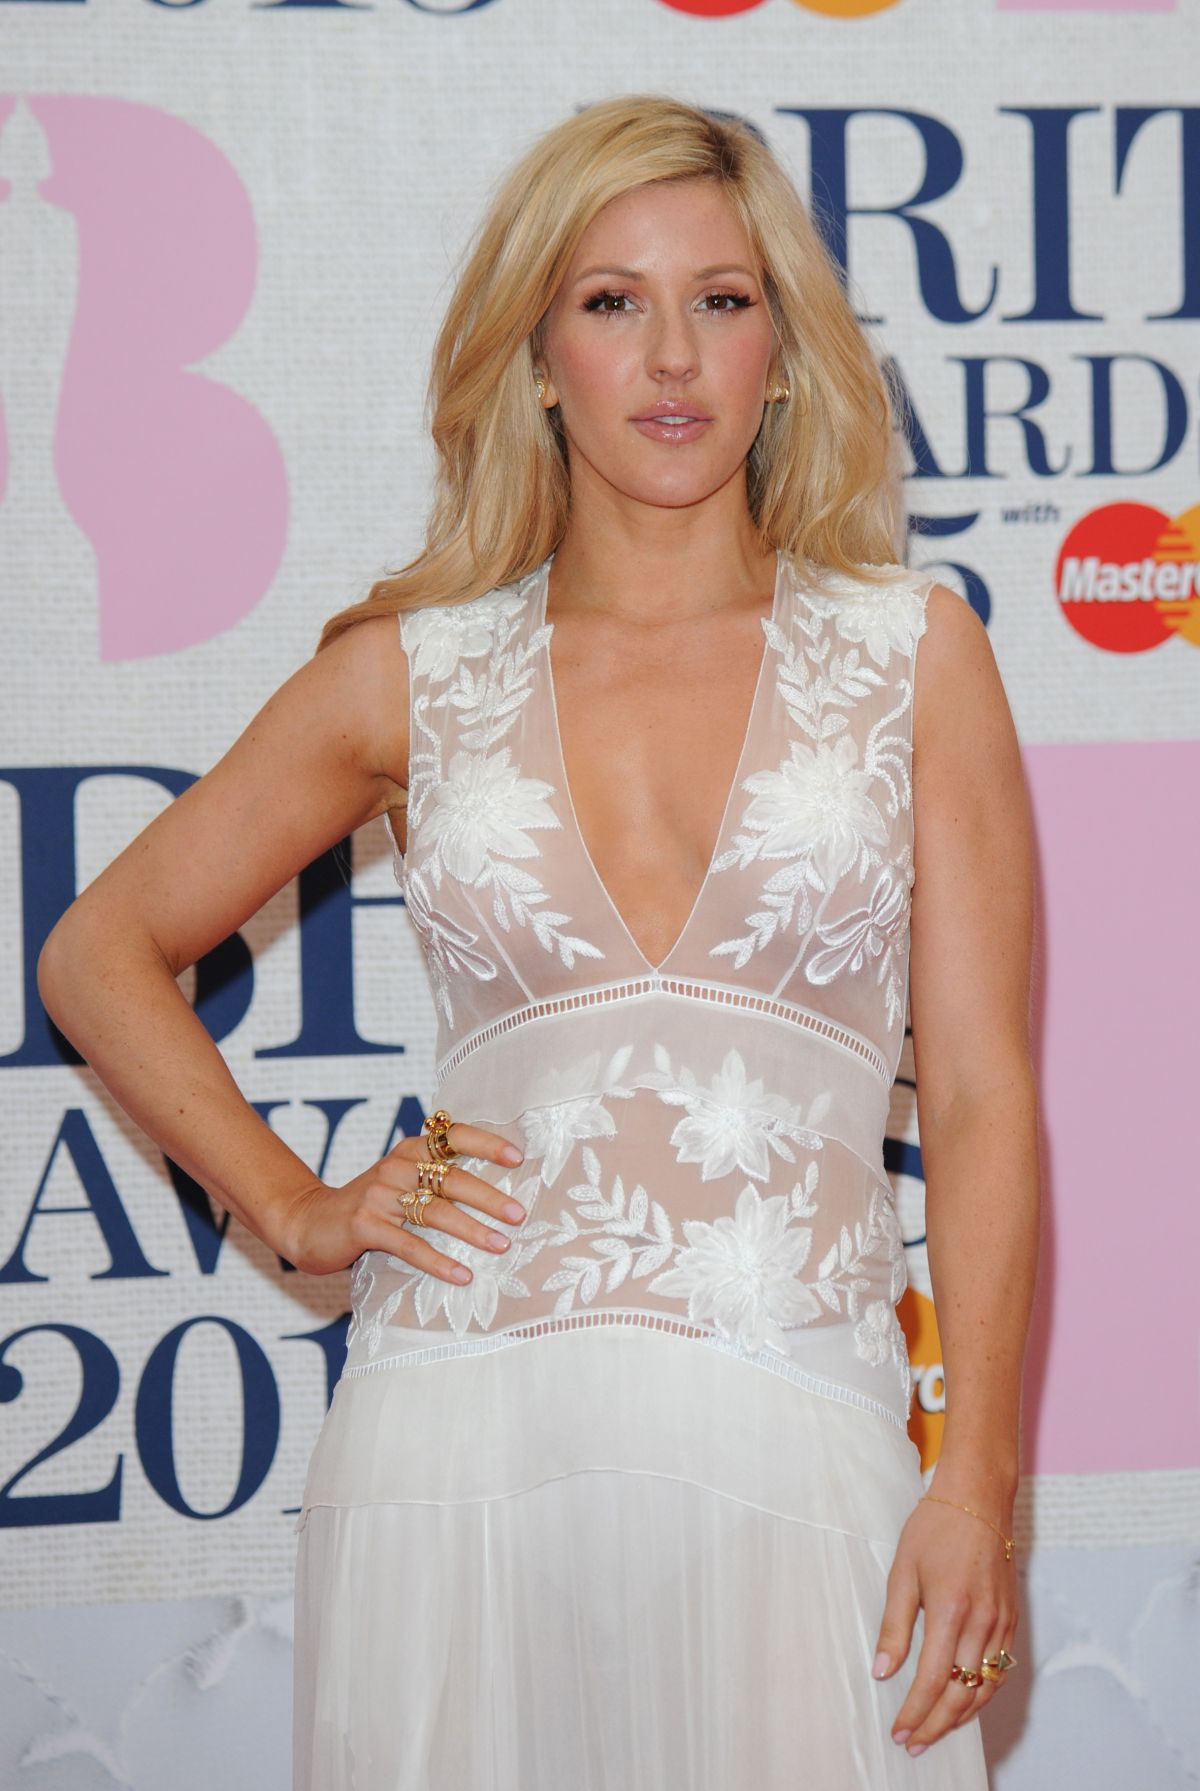 ELLIE GOULDING at Brit Awards 2015 in London – HawtCelebs